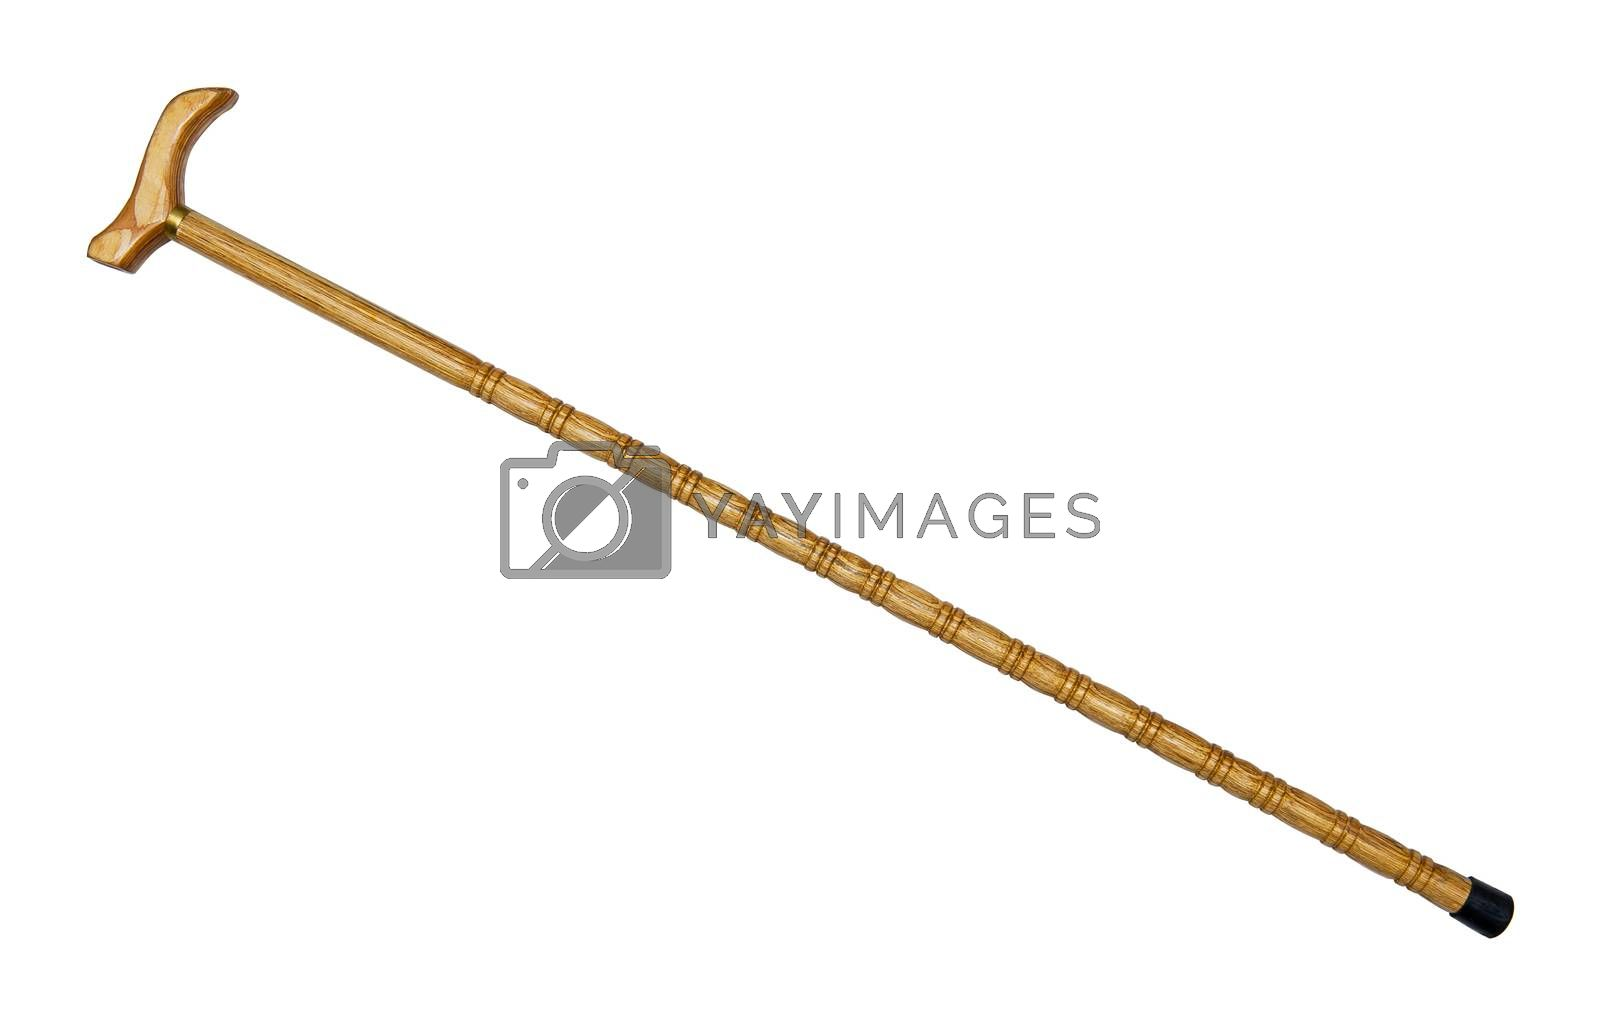 Walking stick isolated on the white background